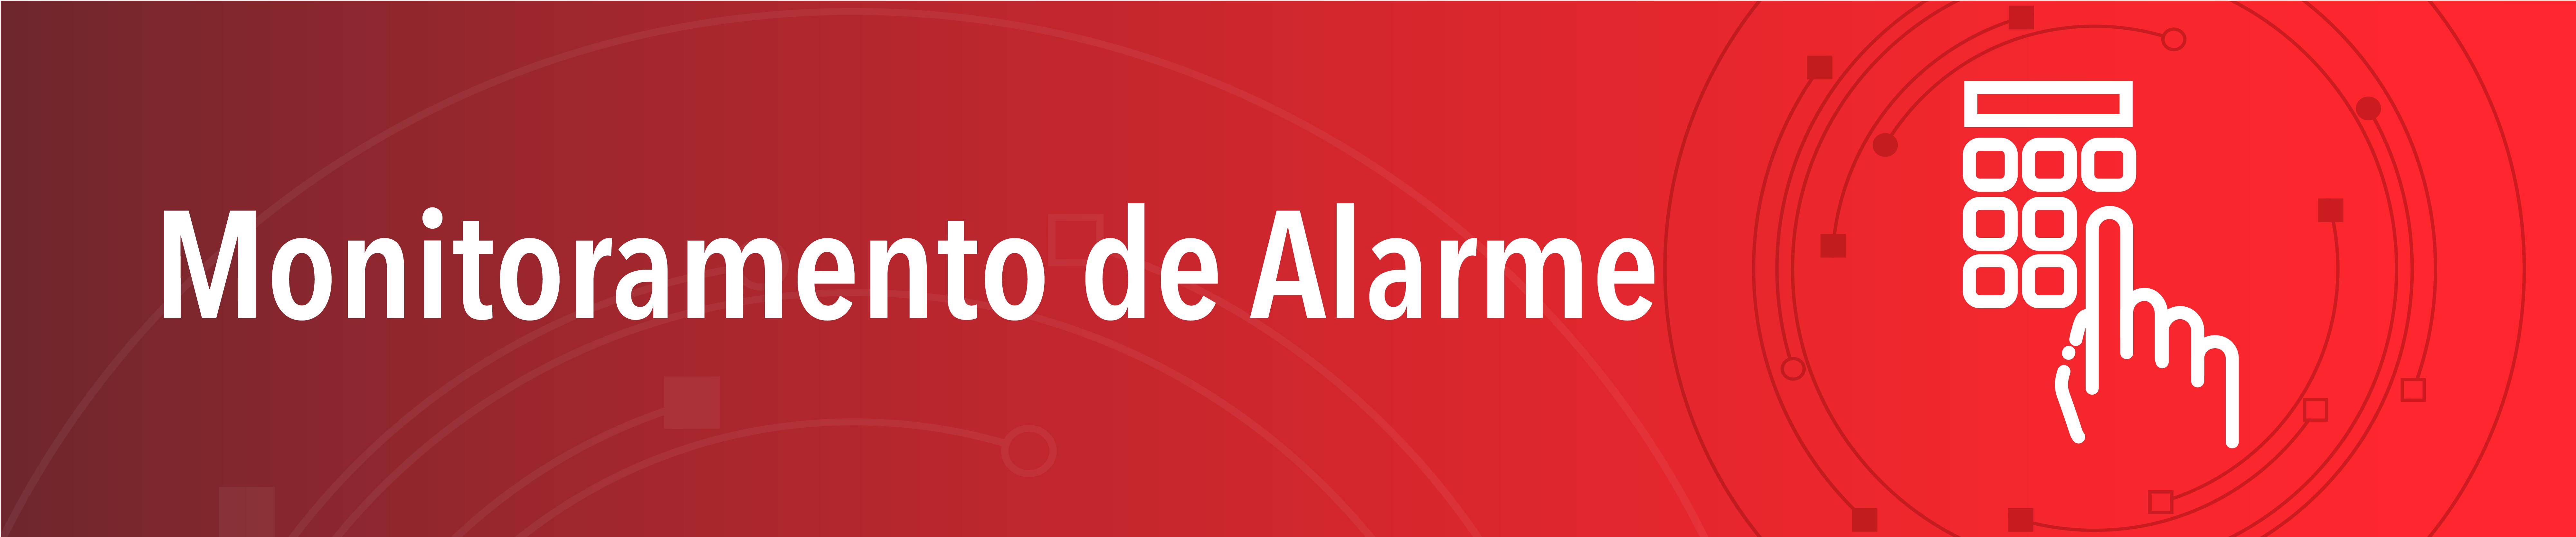 Banner Site Protector_SERVIÇOS_Minitoramento de Alarme (1)